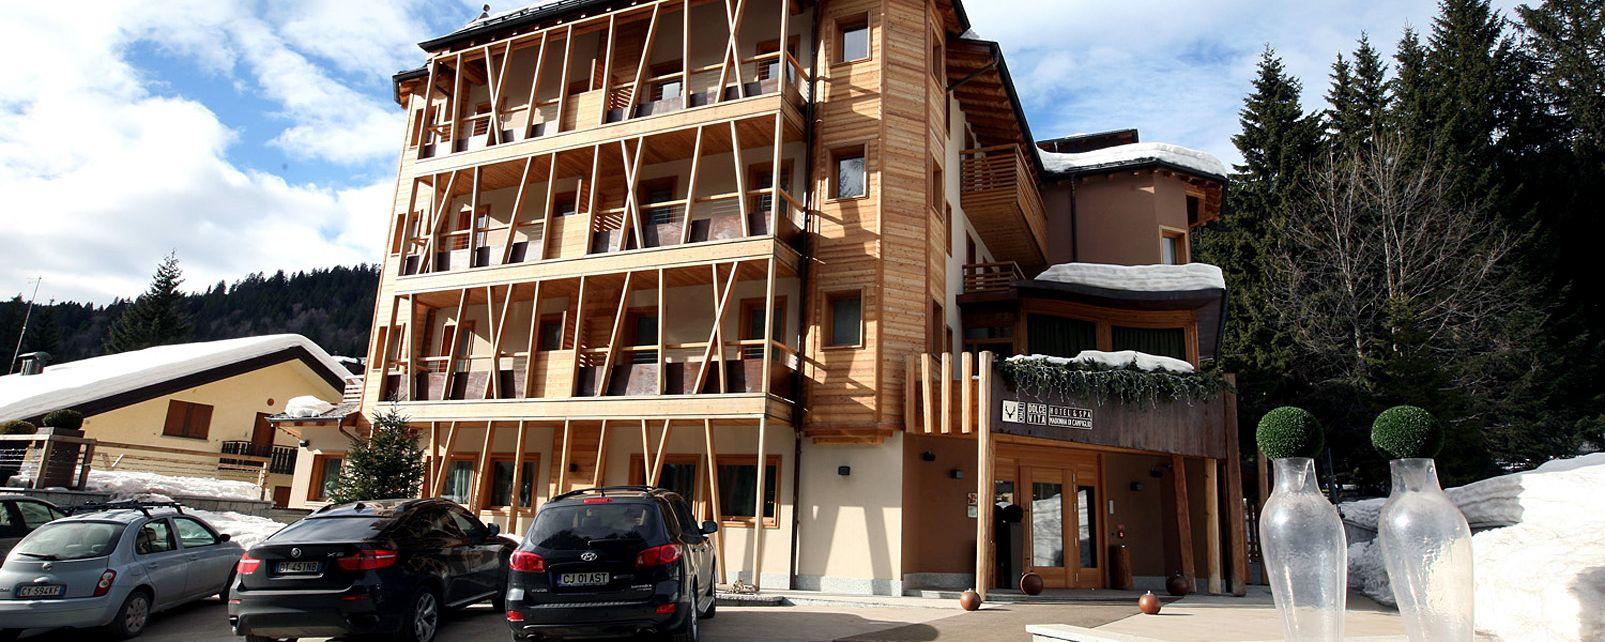 Hôtel Chalet Dolce Vita